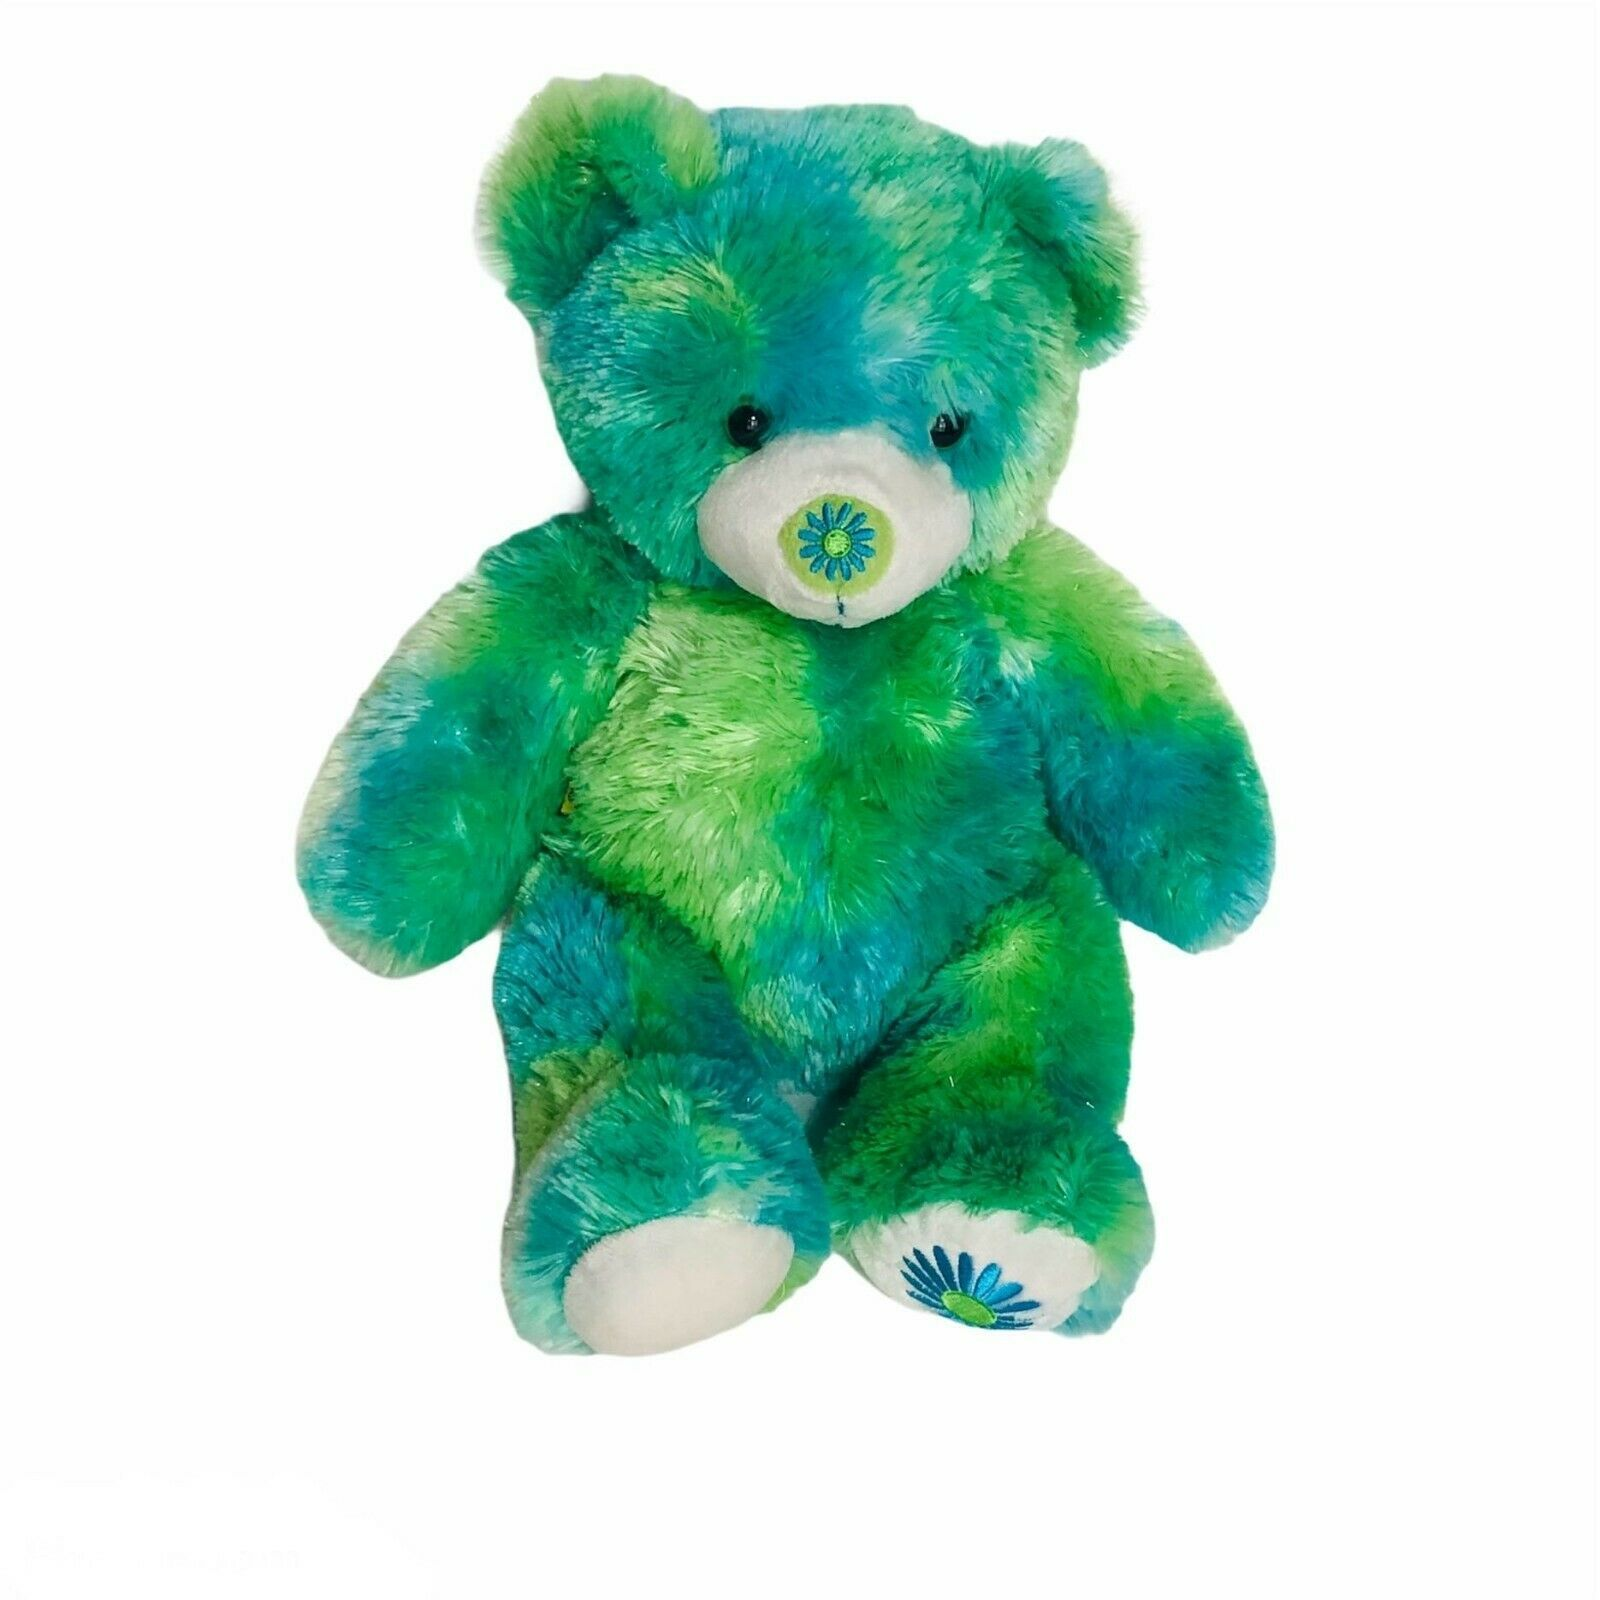 "Build A Bear Green Summer Teddy 2007 Plush Retired Stuffed Animal 15"" Tie Dye - $24.70"